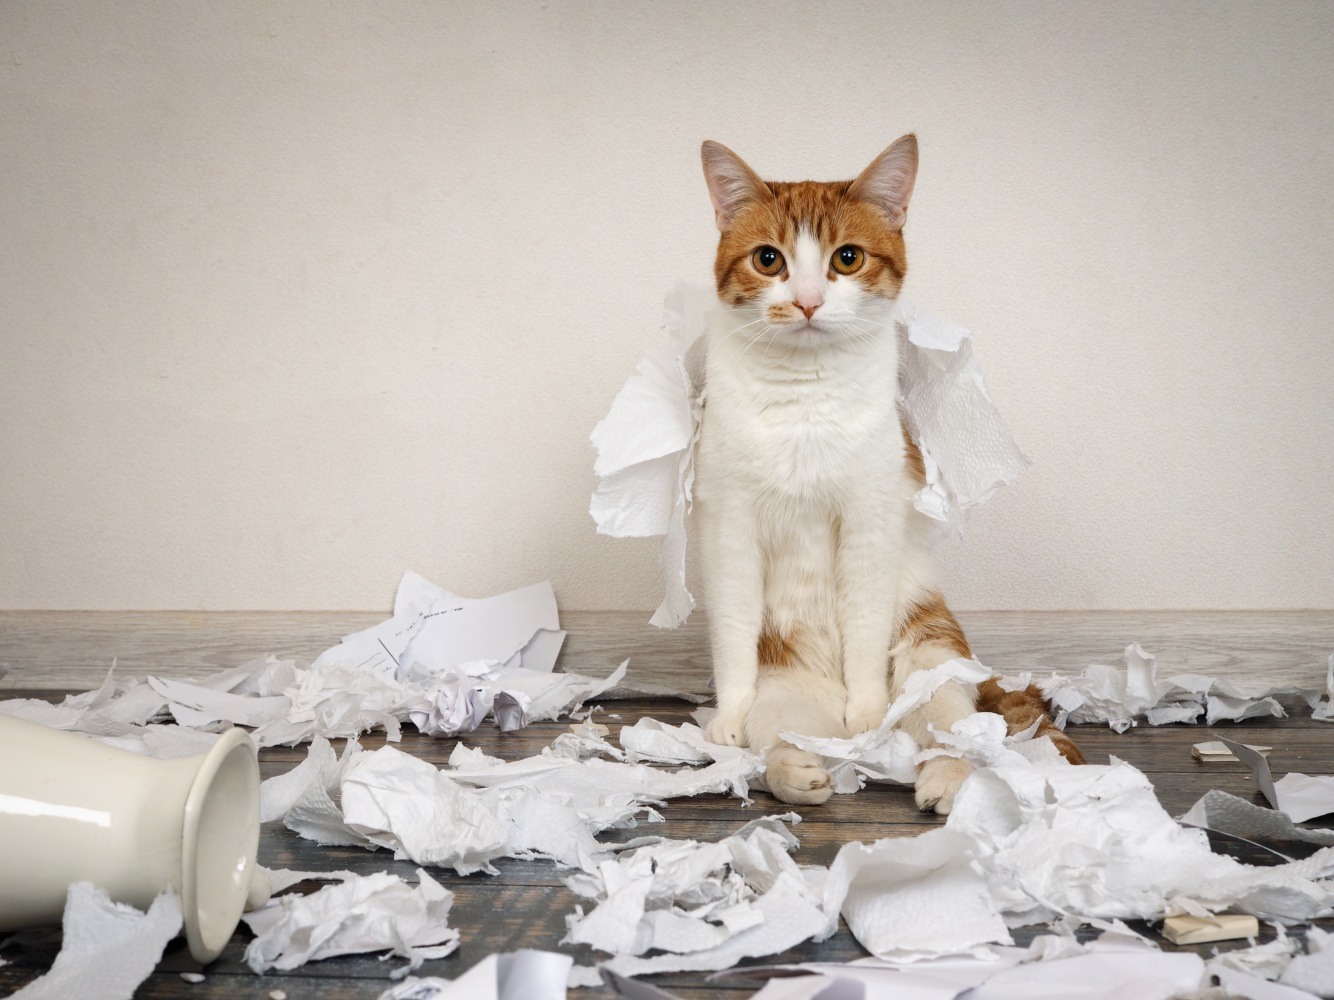 gato no meio de papéis